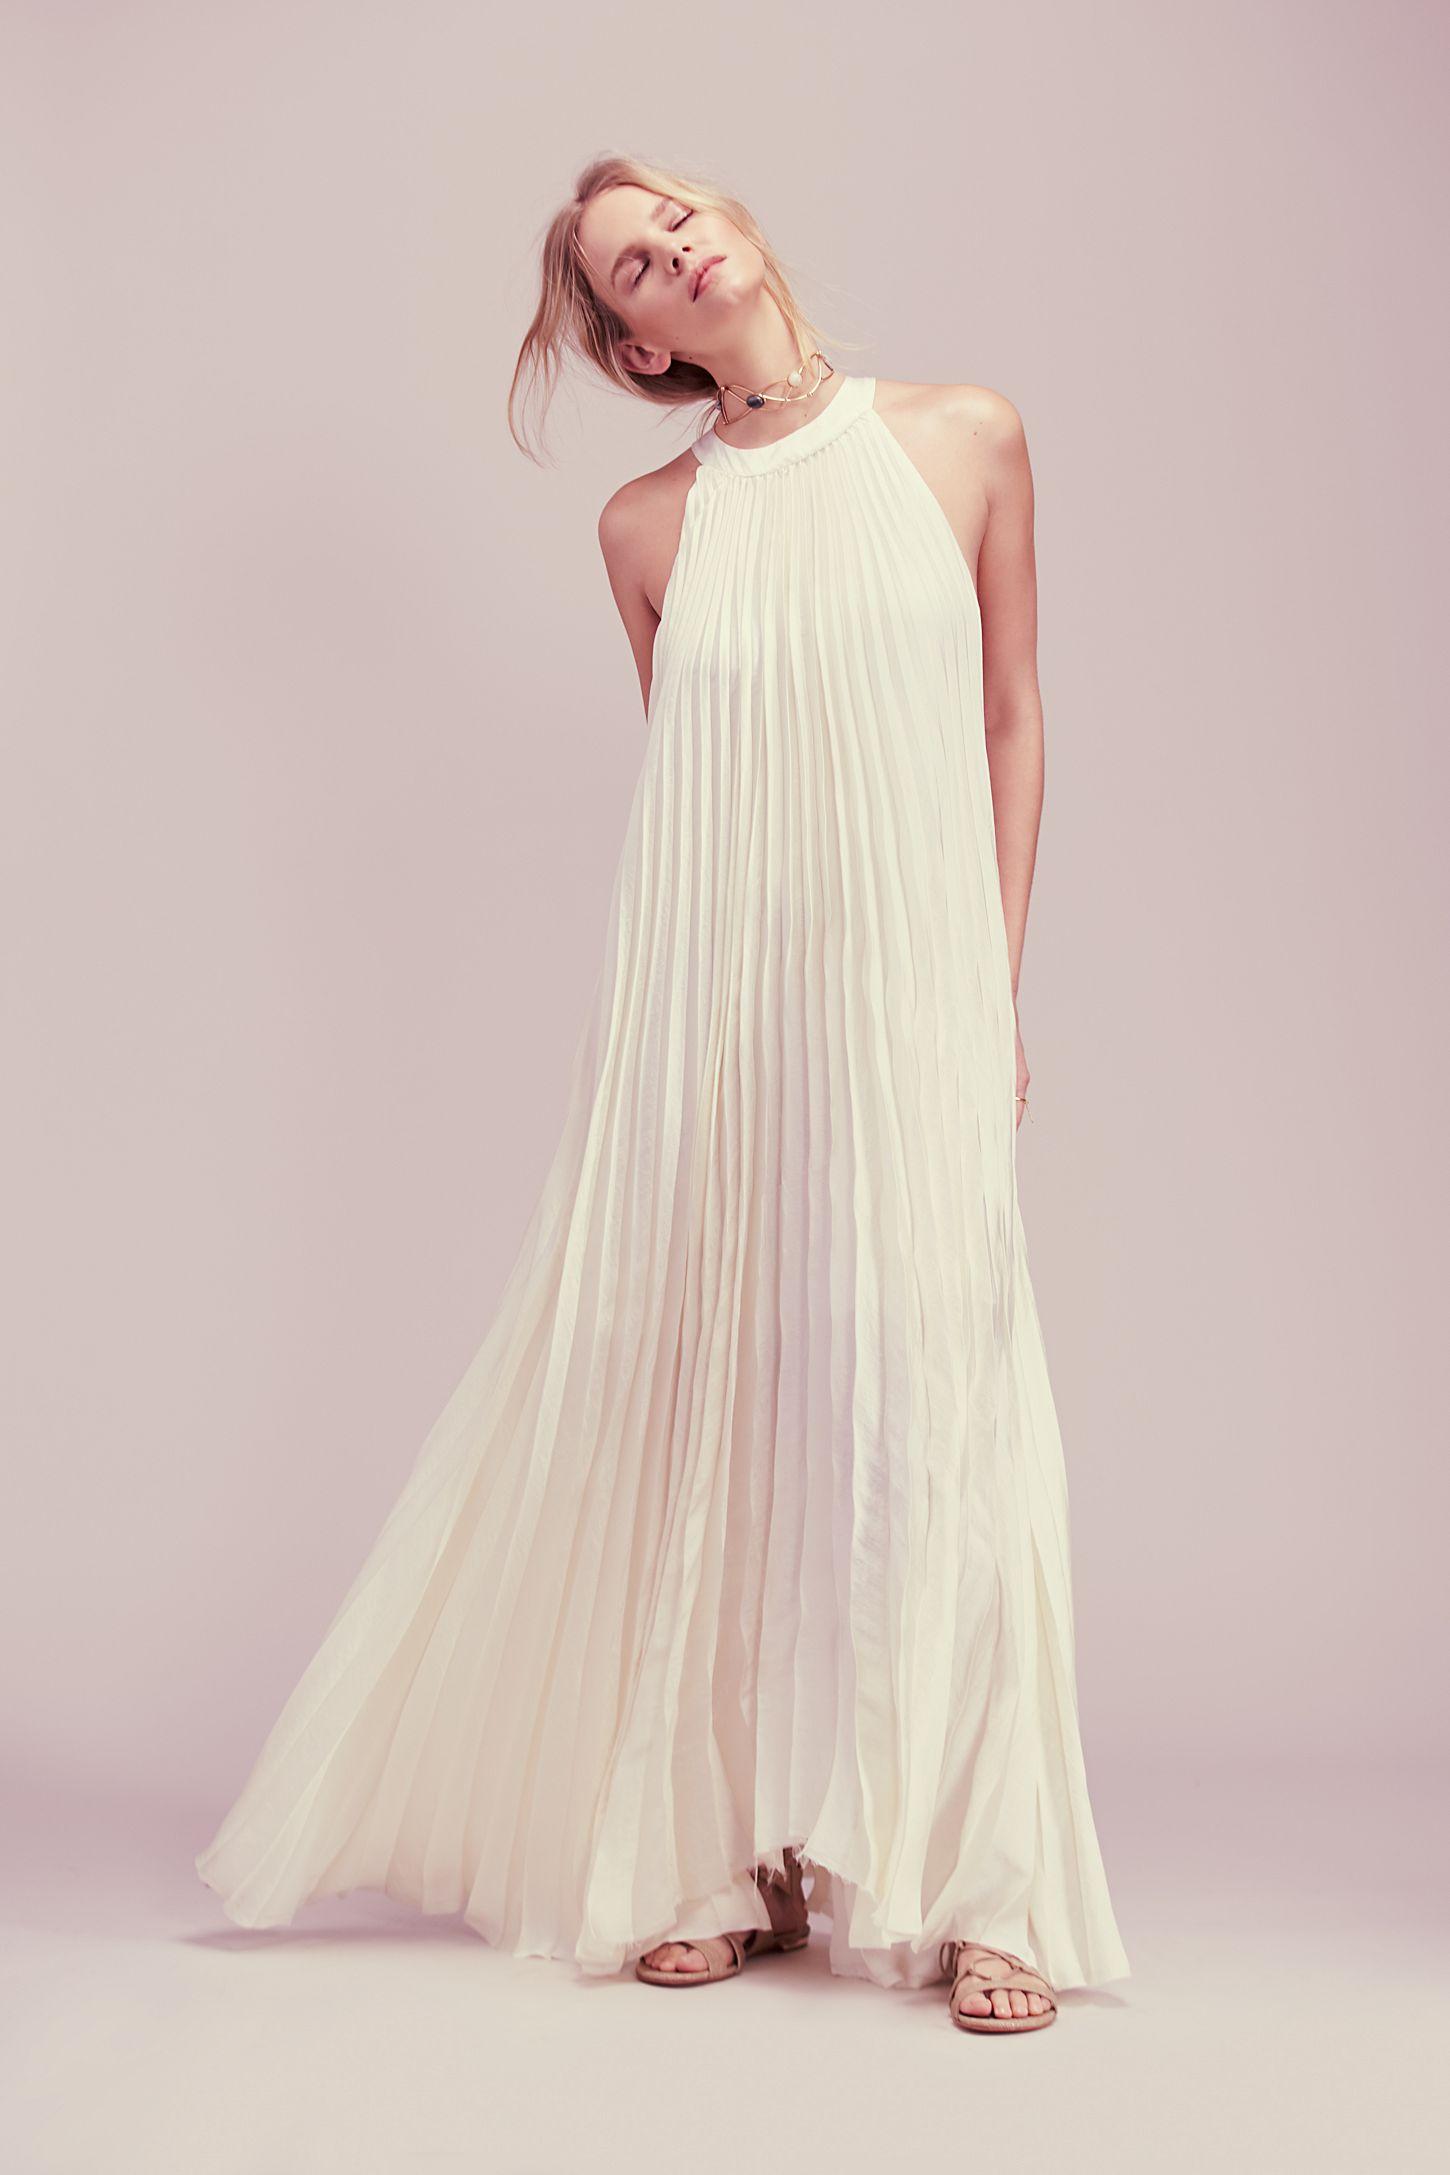 Porter Dress | Free People